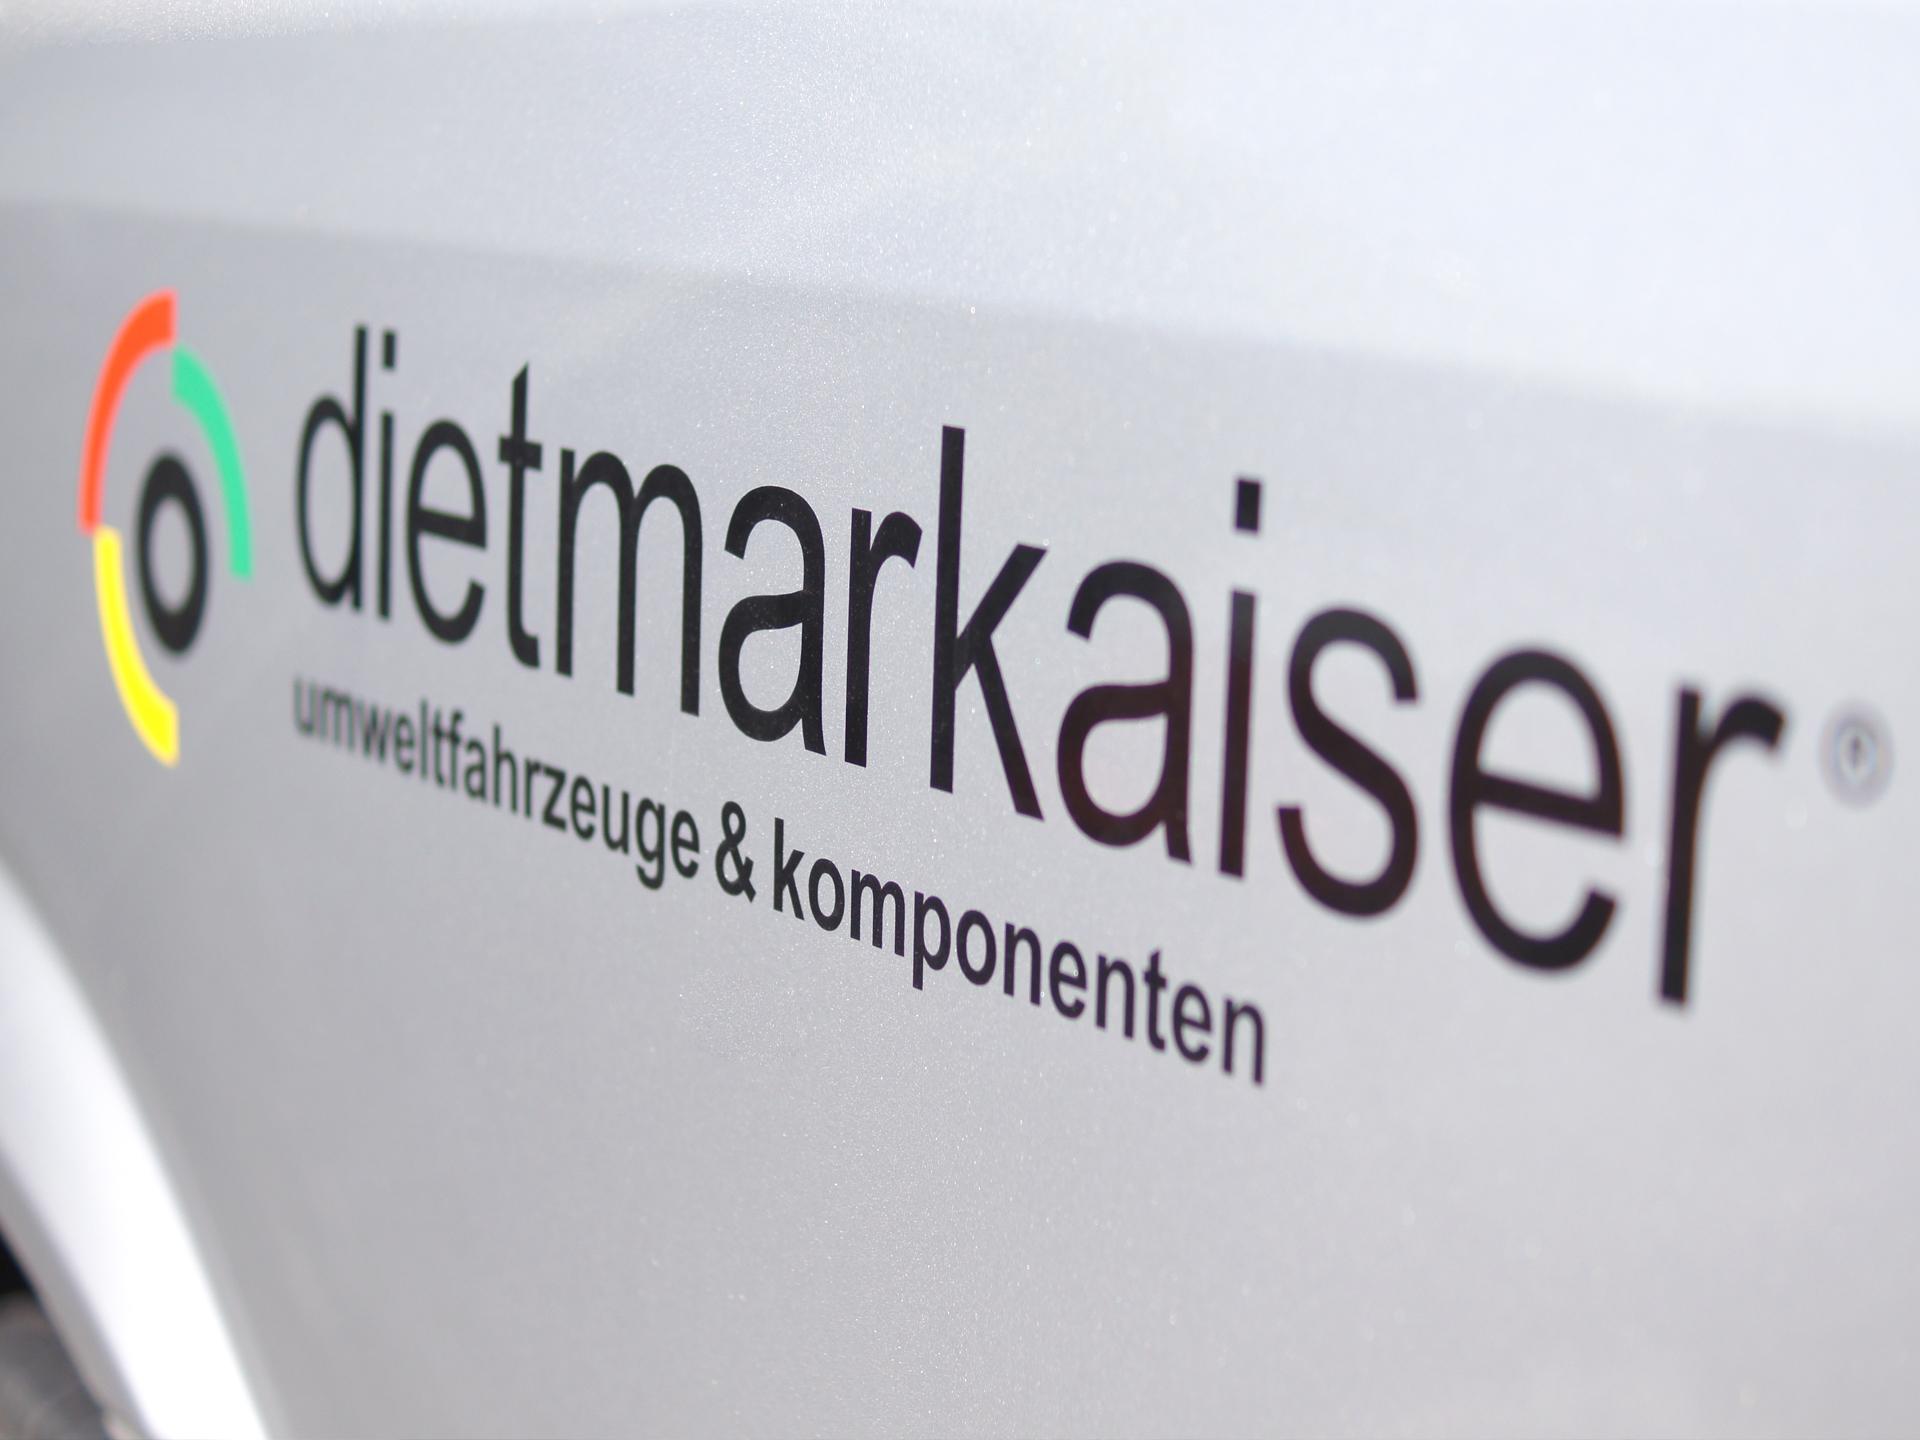 SM_Referenzen_Autobeschriftung_DK5